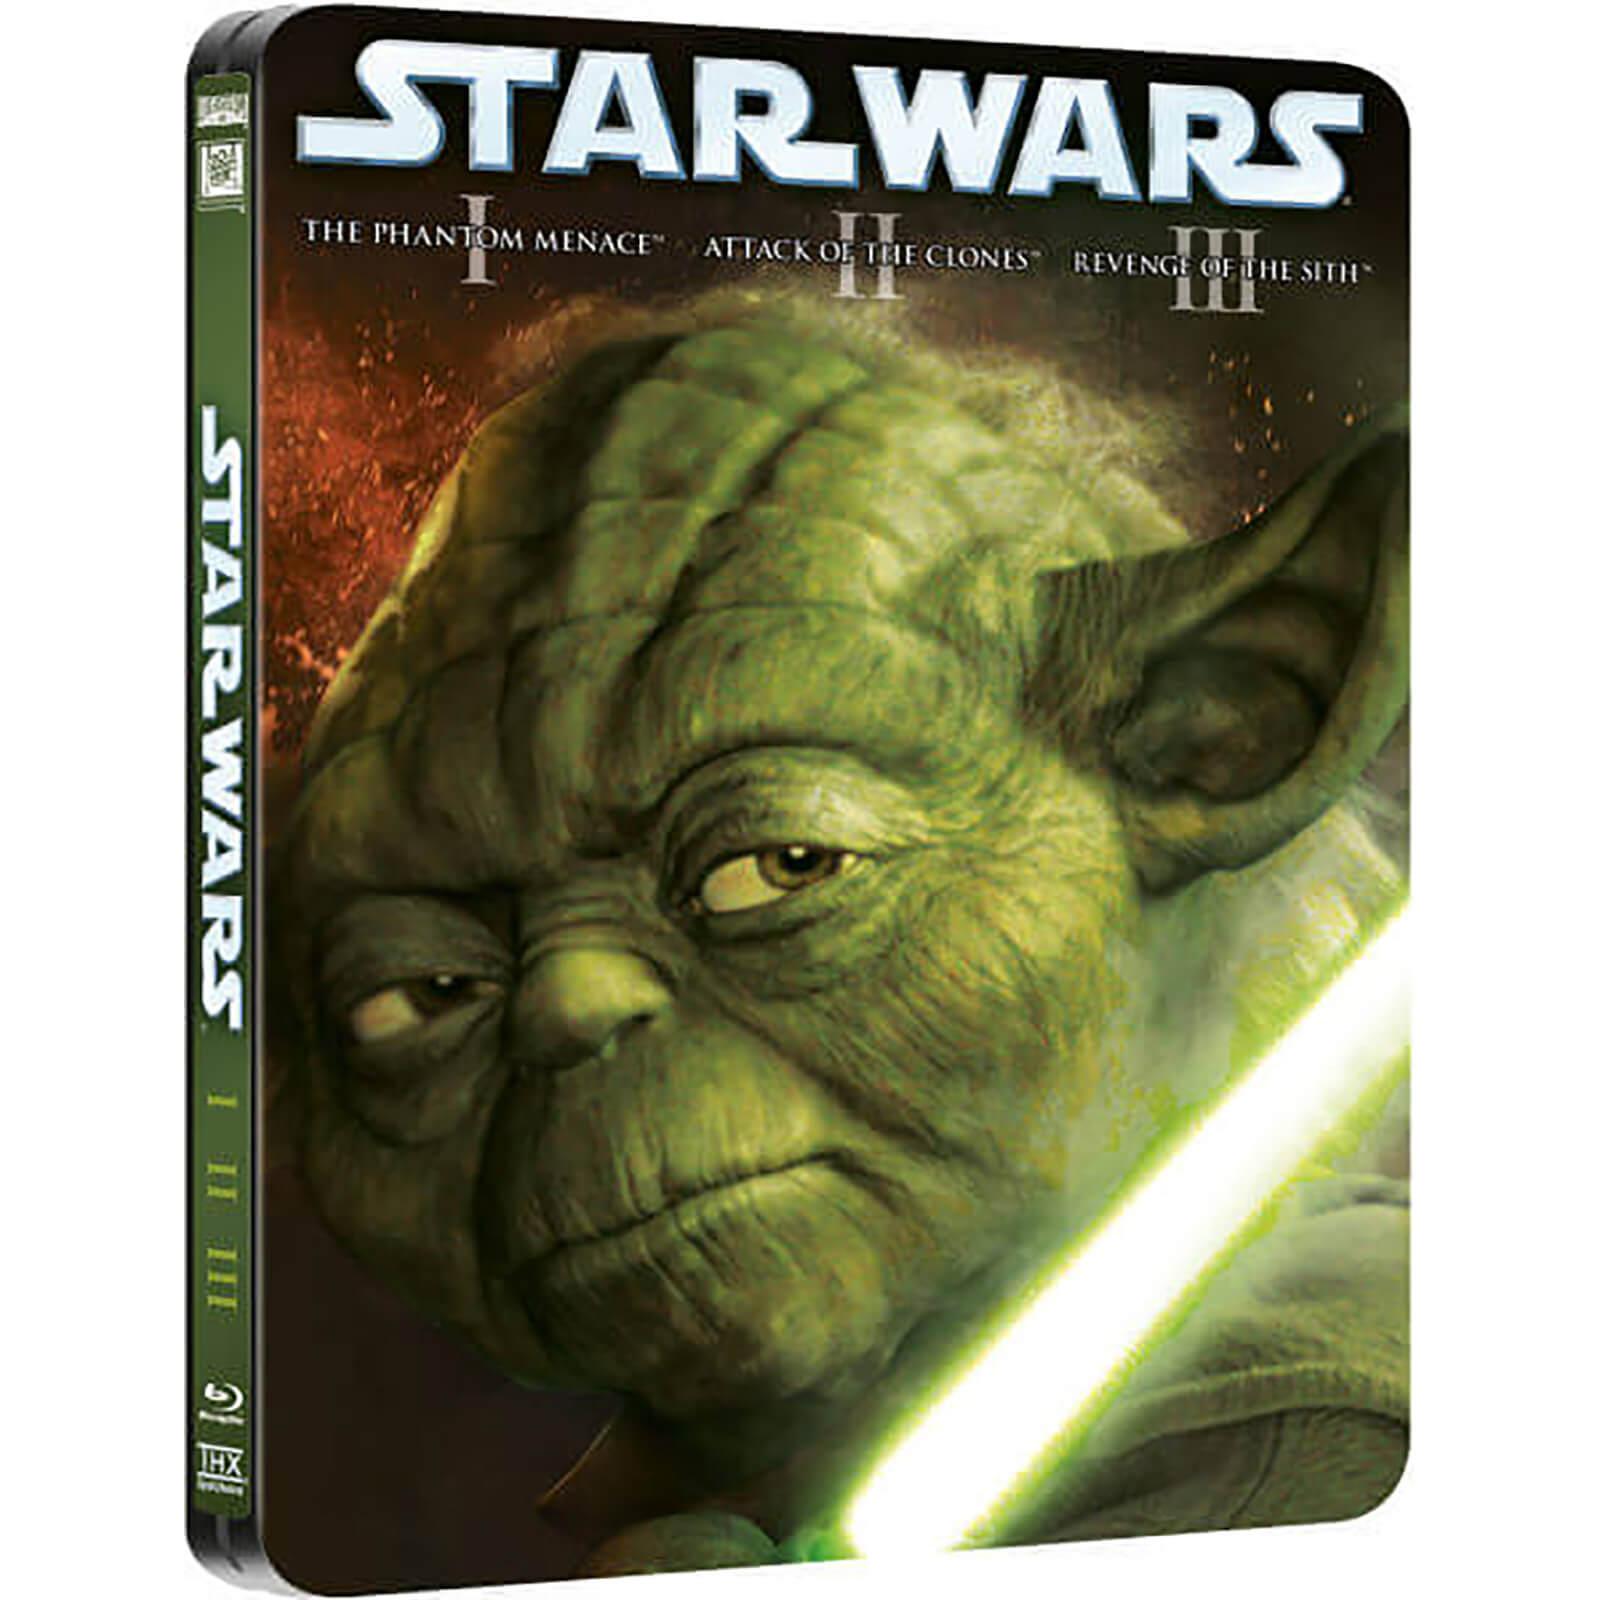 Star Wars Prequel Trilogy Limited Edition Steelbook